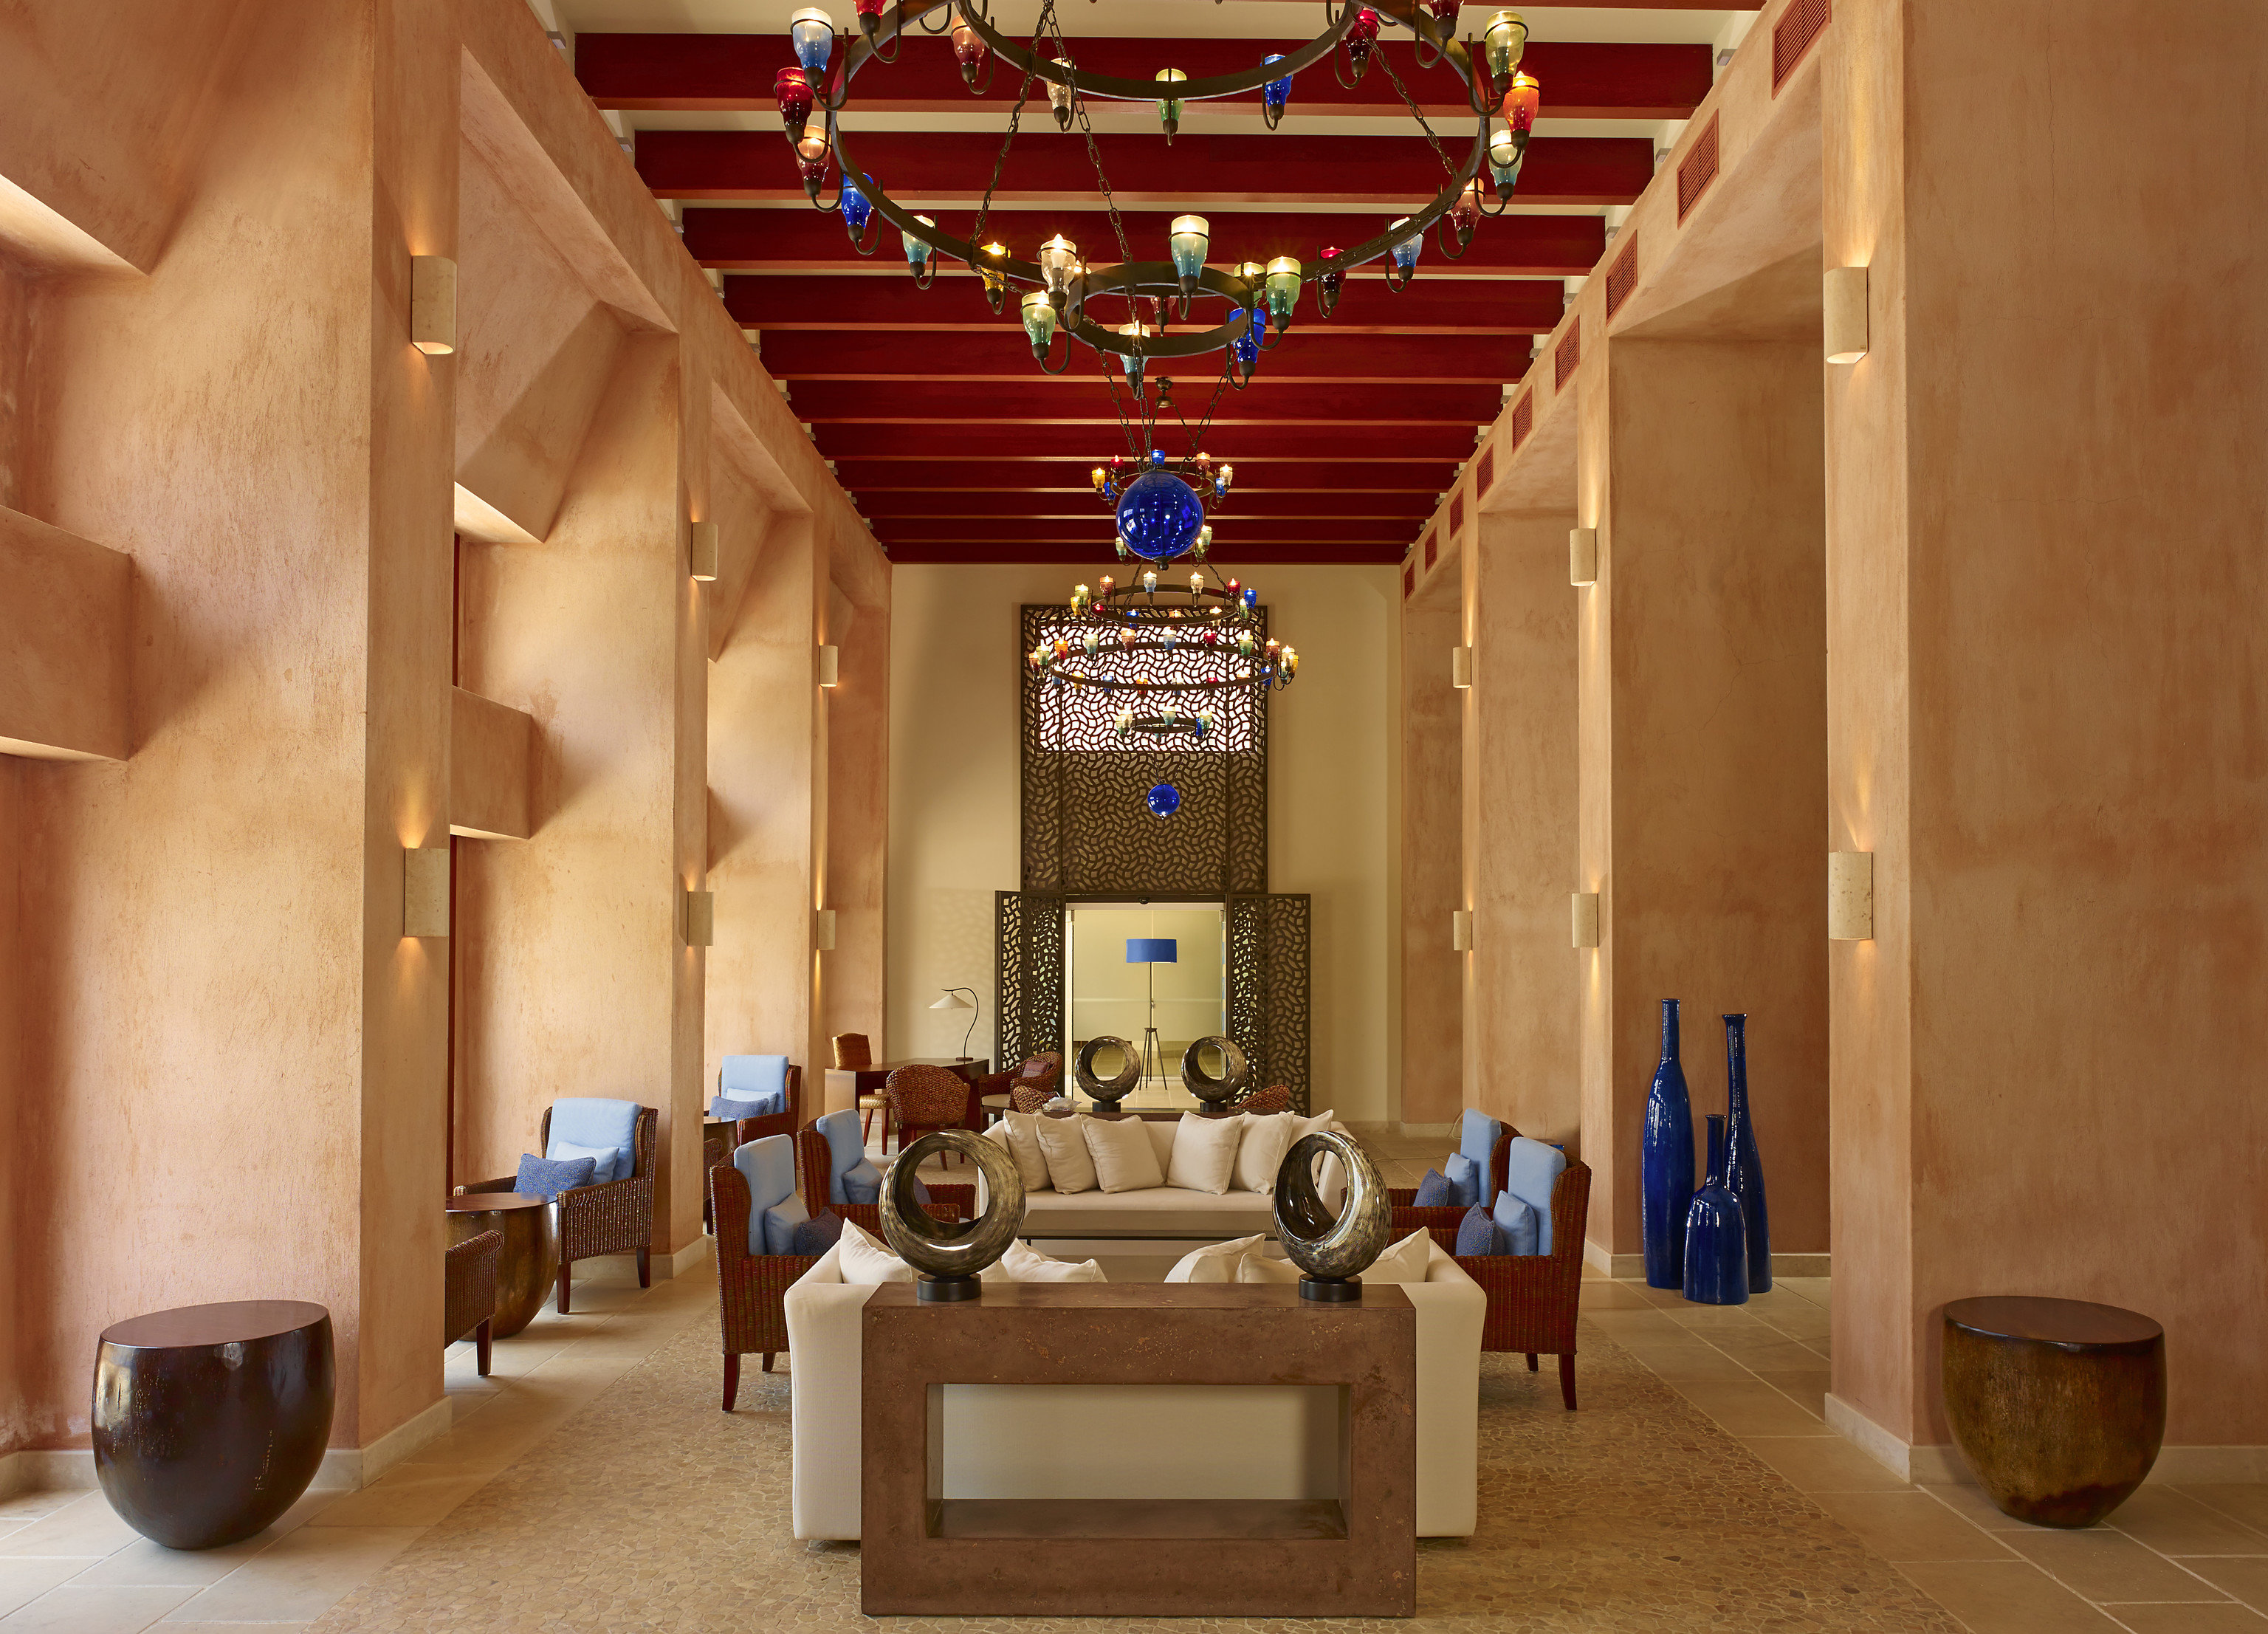 Hotels Romance floor indoor room estate living room interior design home wood ceiling hall chapel Lobby furniture